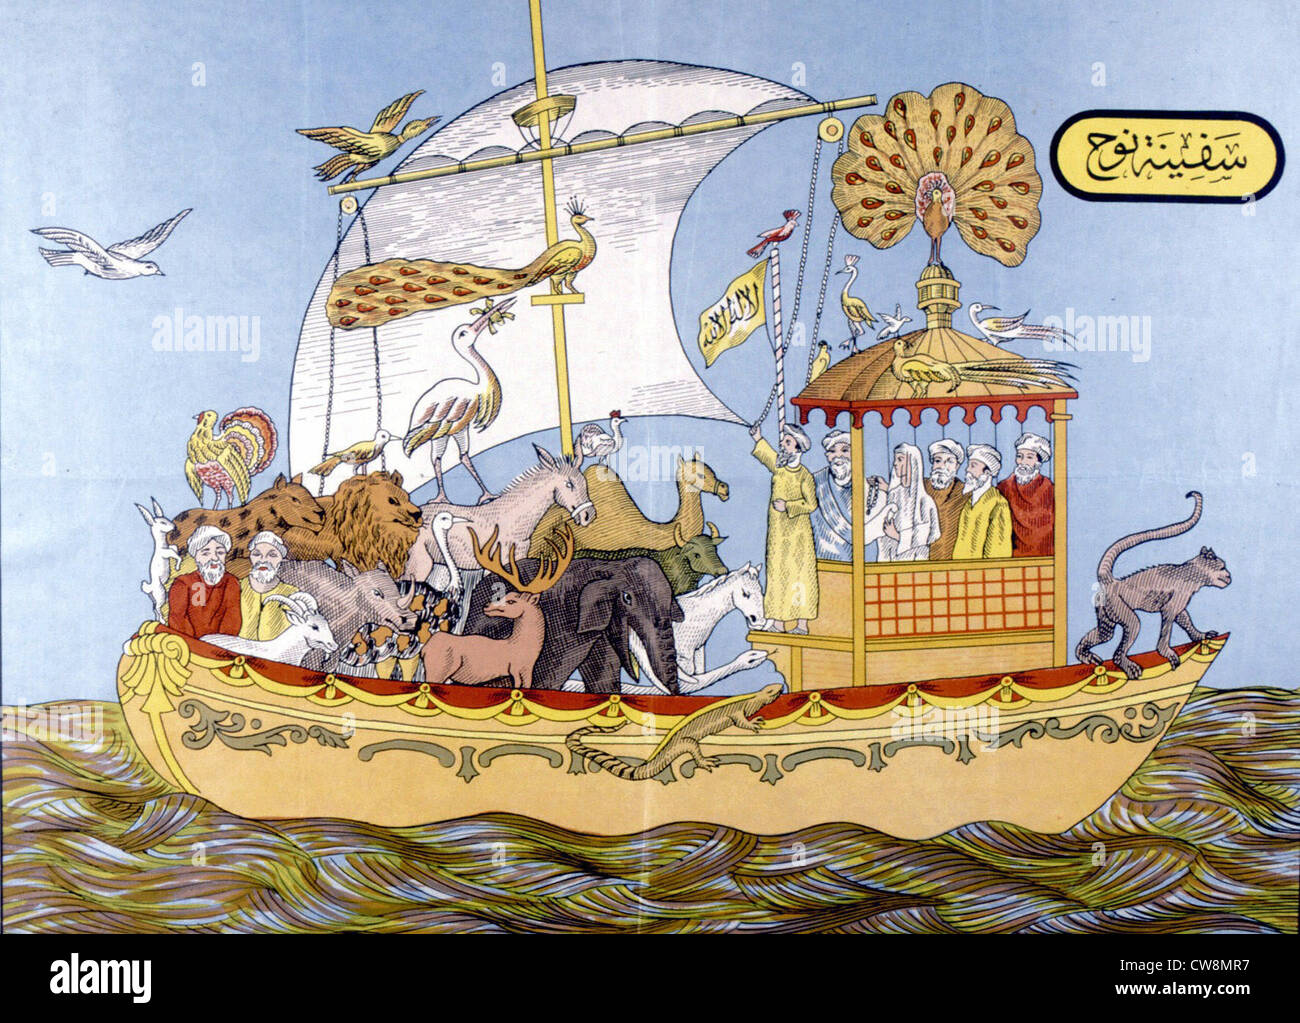 Noah's Ark, illustrations of the 19th century - Stock Image